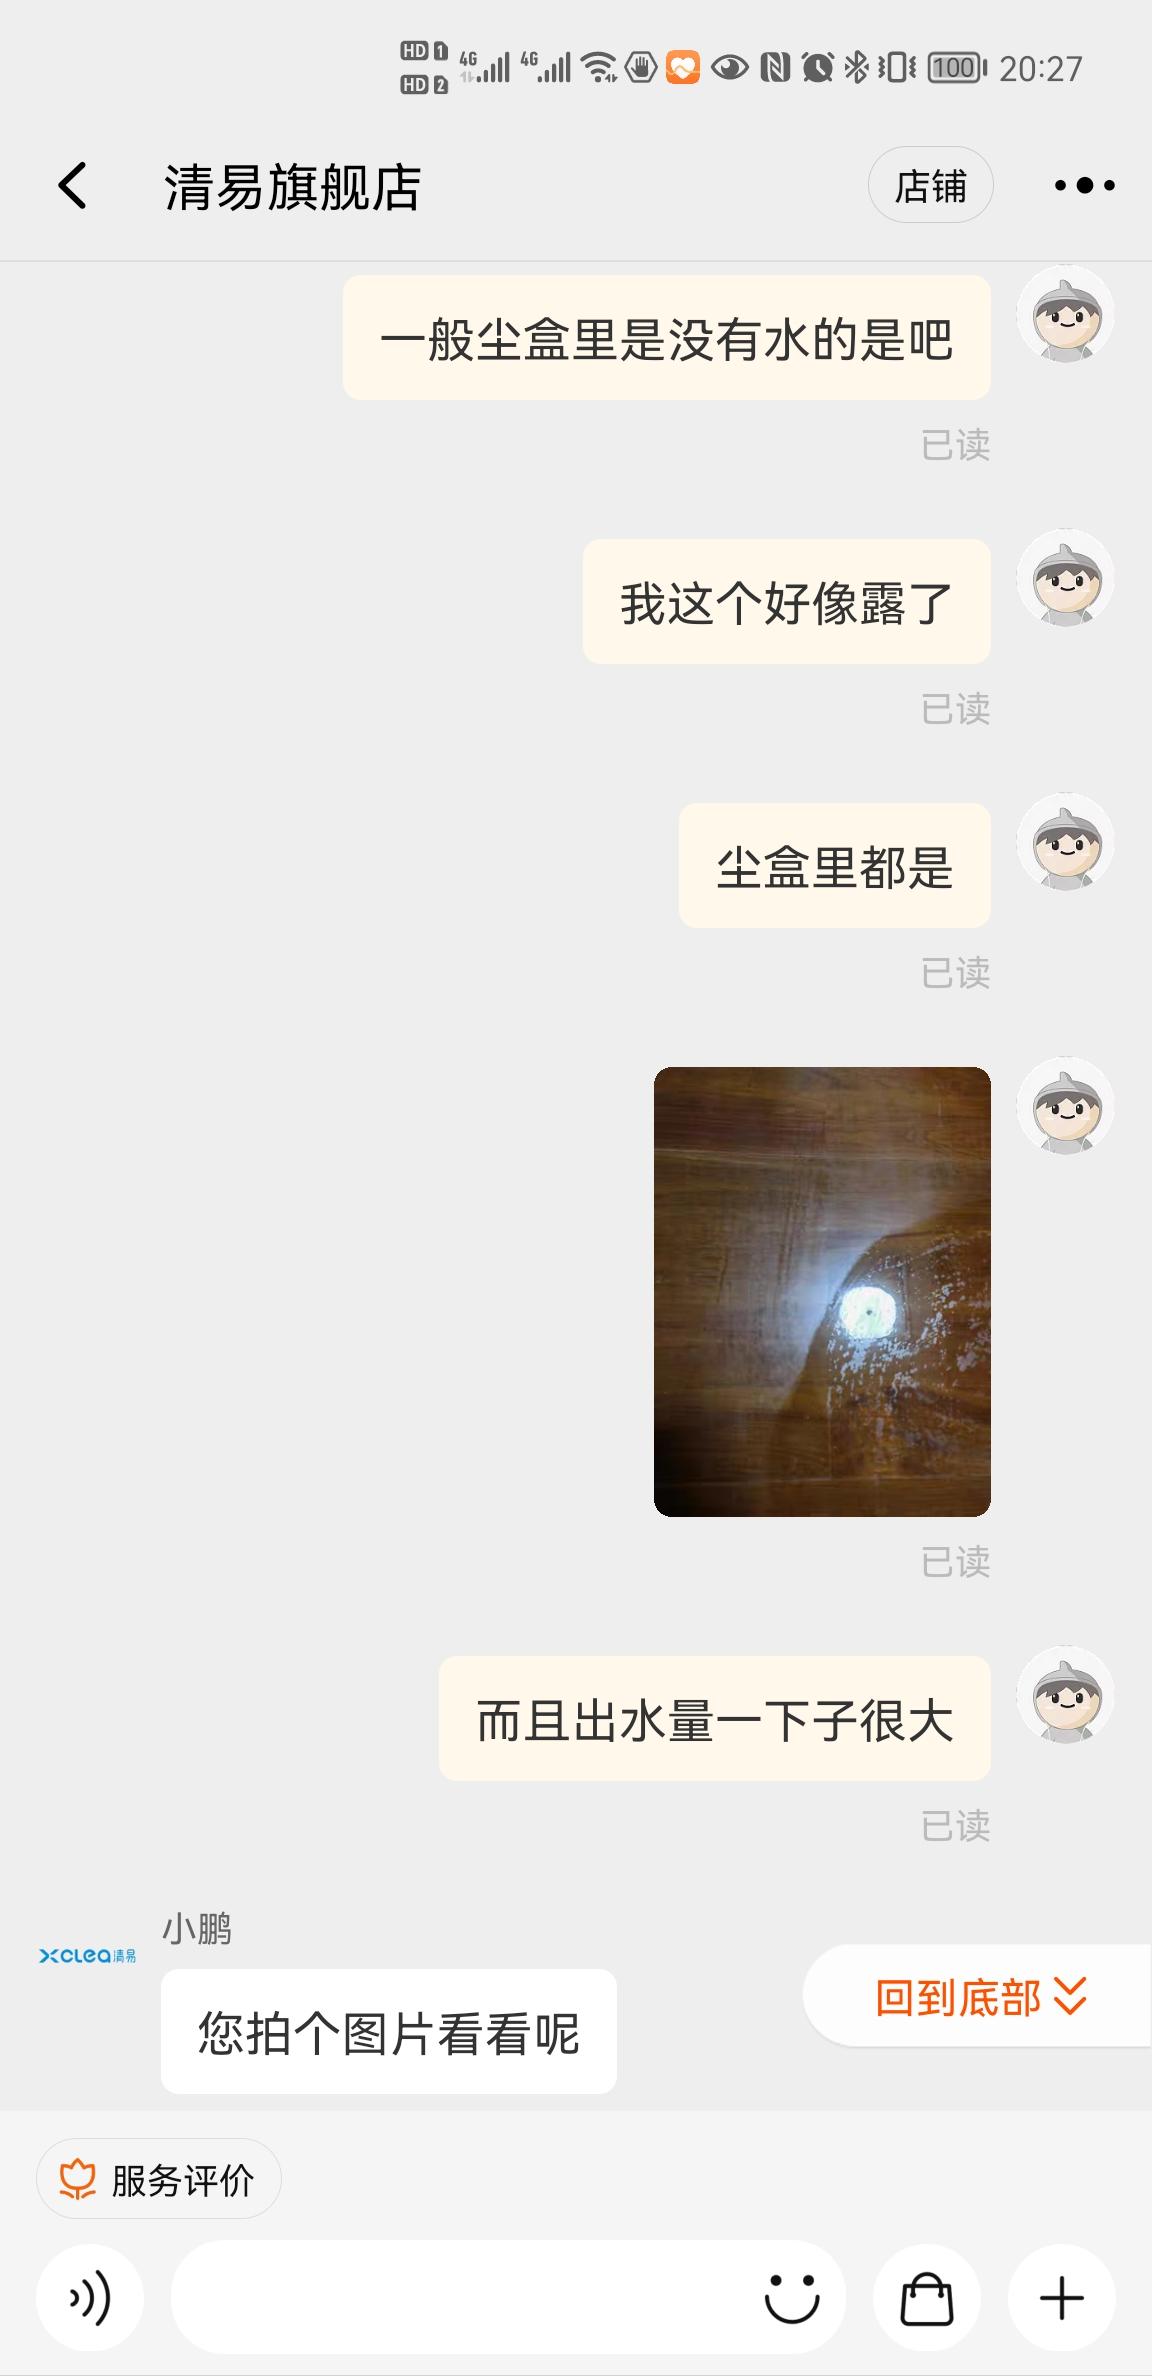 Screenshot_20210903_202710_com.taobao.taobao.jpg